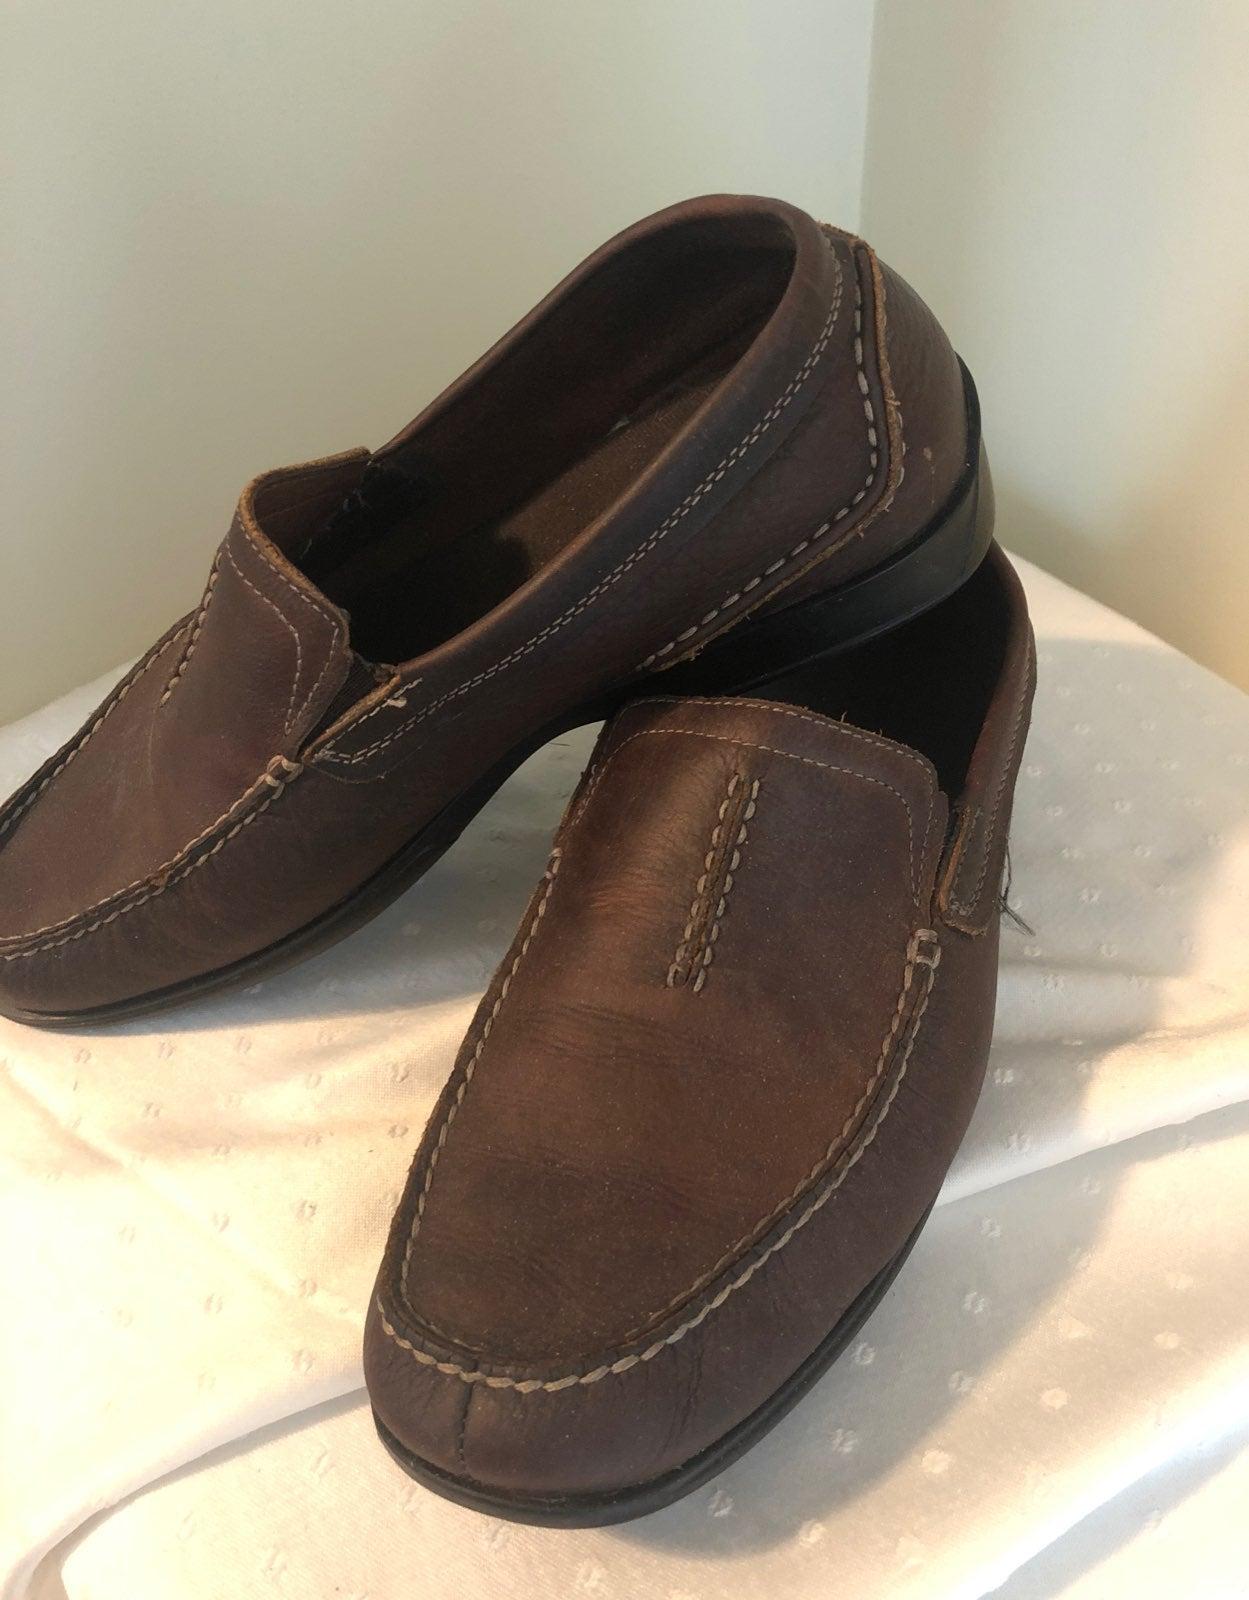 Clarks brown slip on moccassin. 10.5m